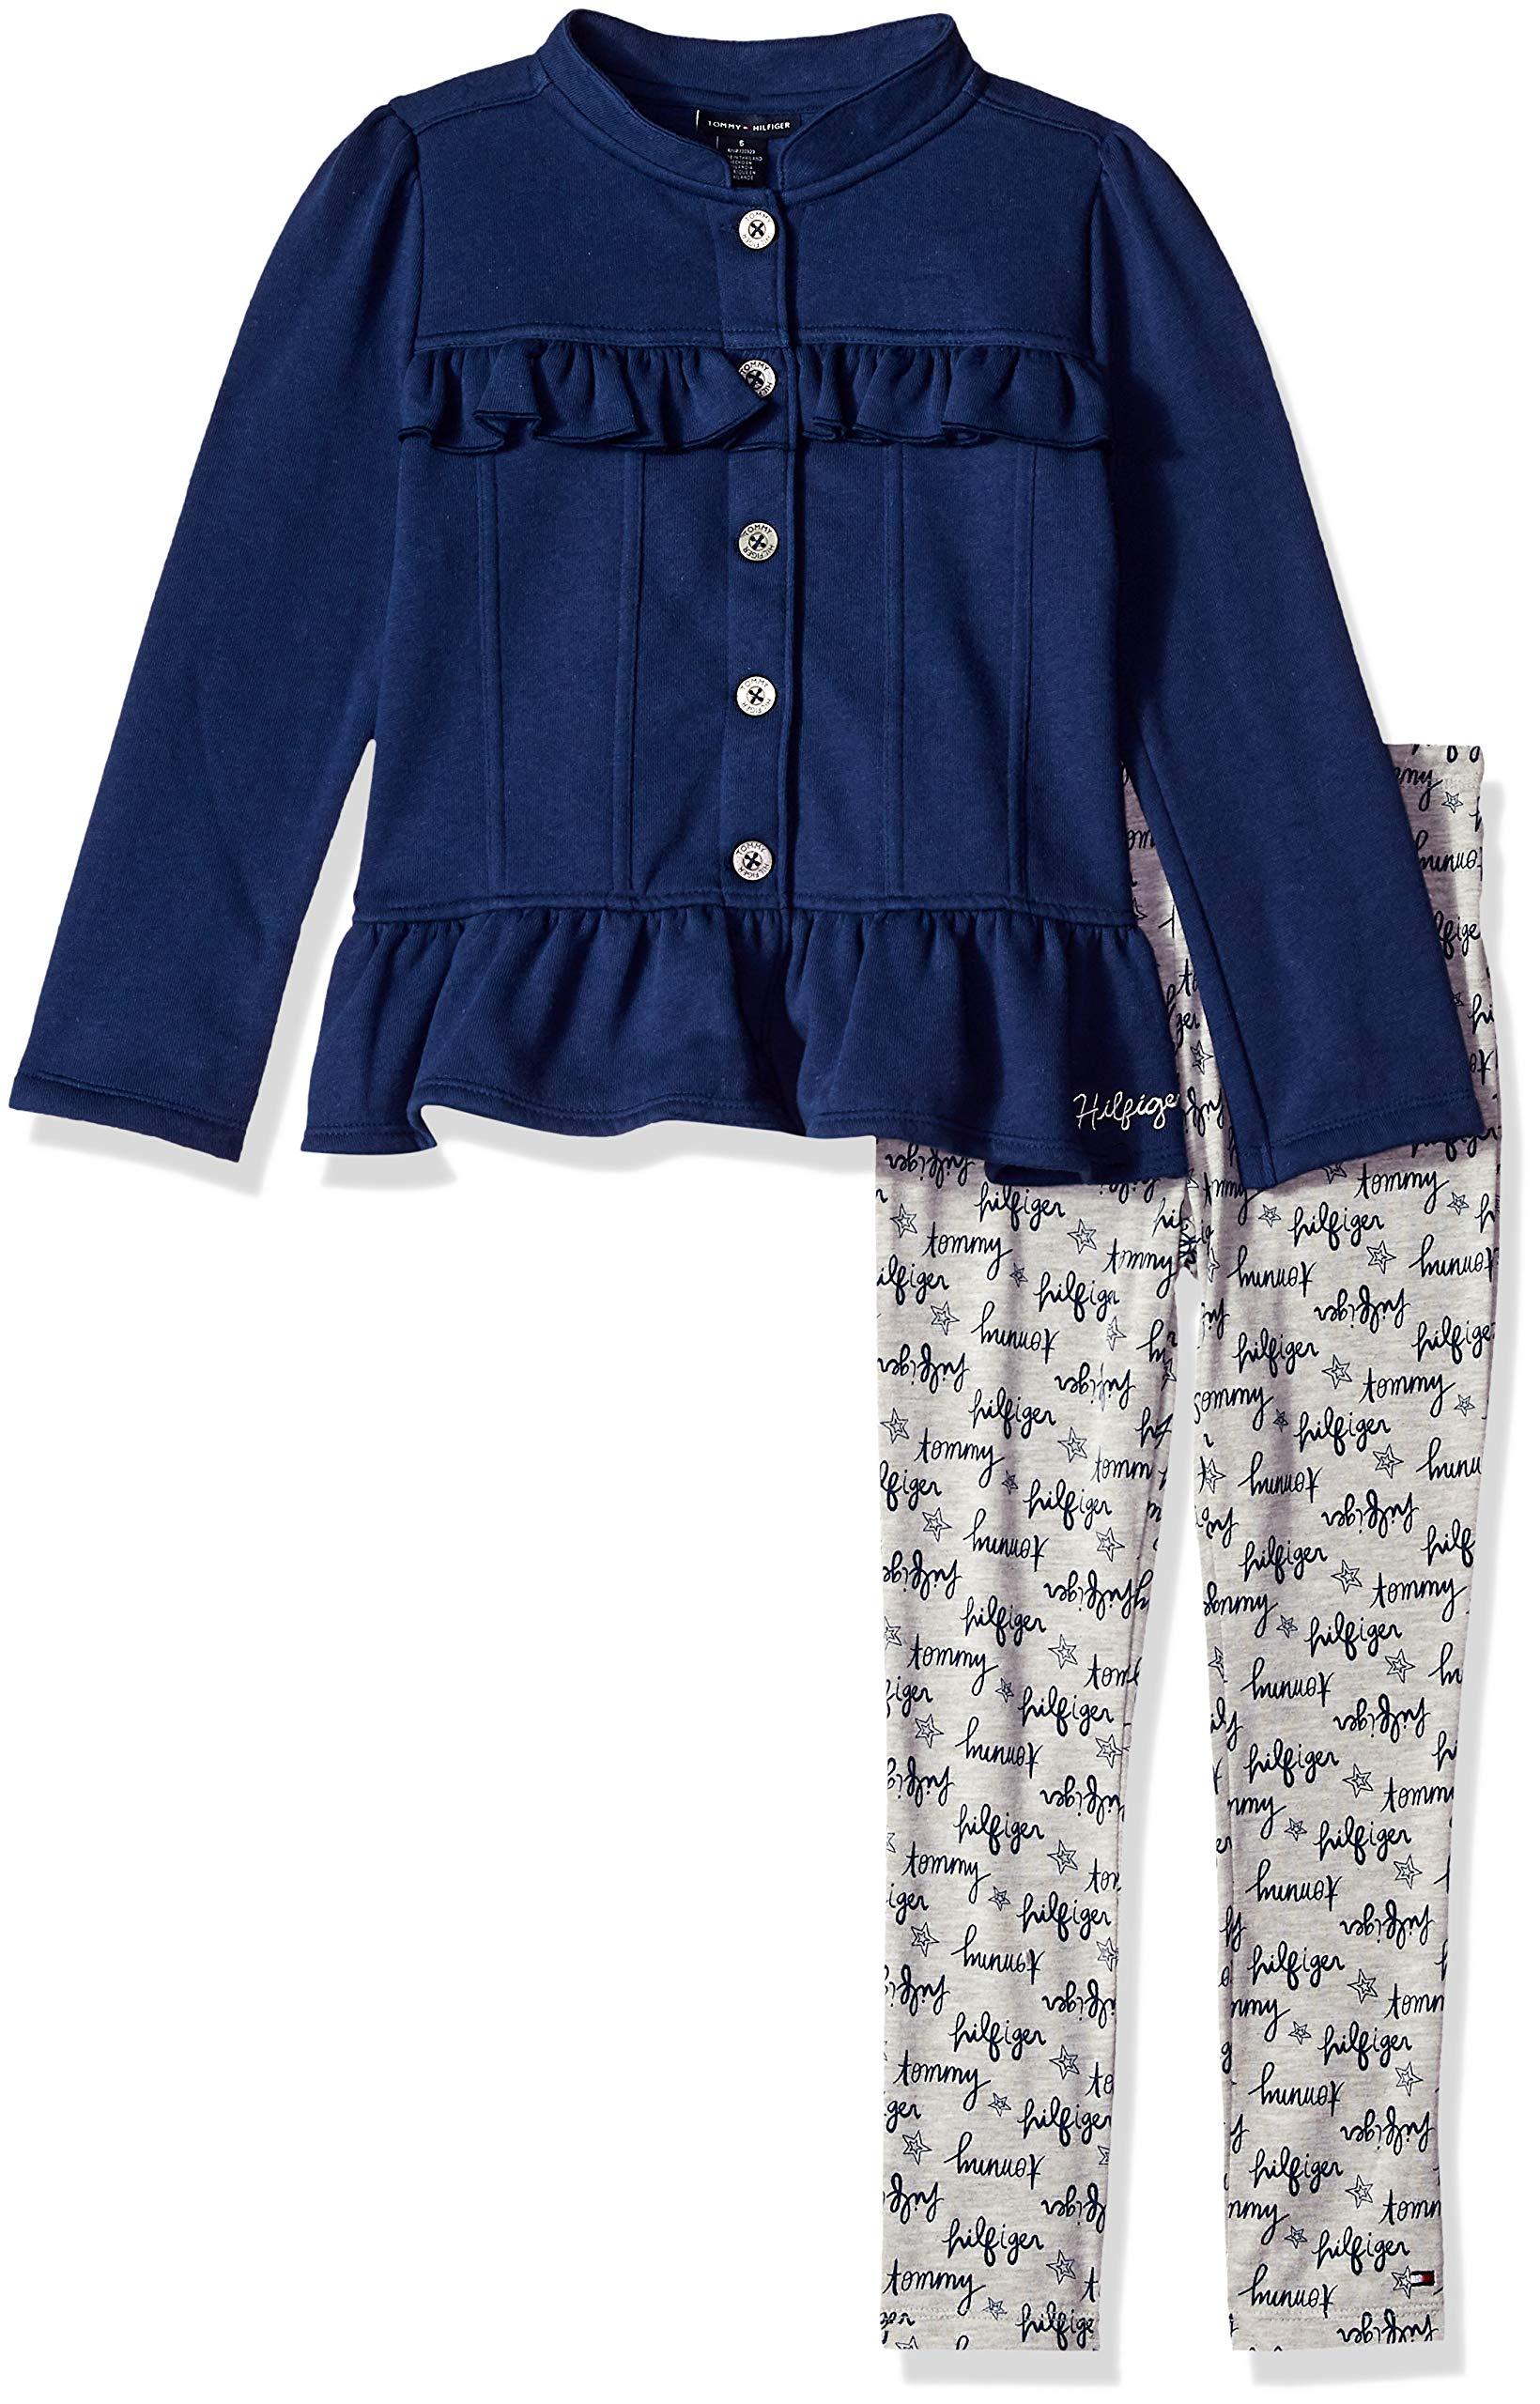 Tommy Hilfiger Girls' 2 Pieces Jacket Set